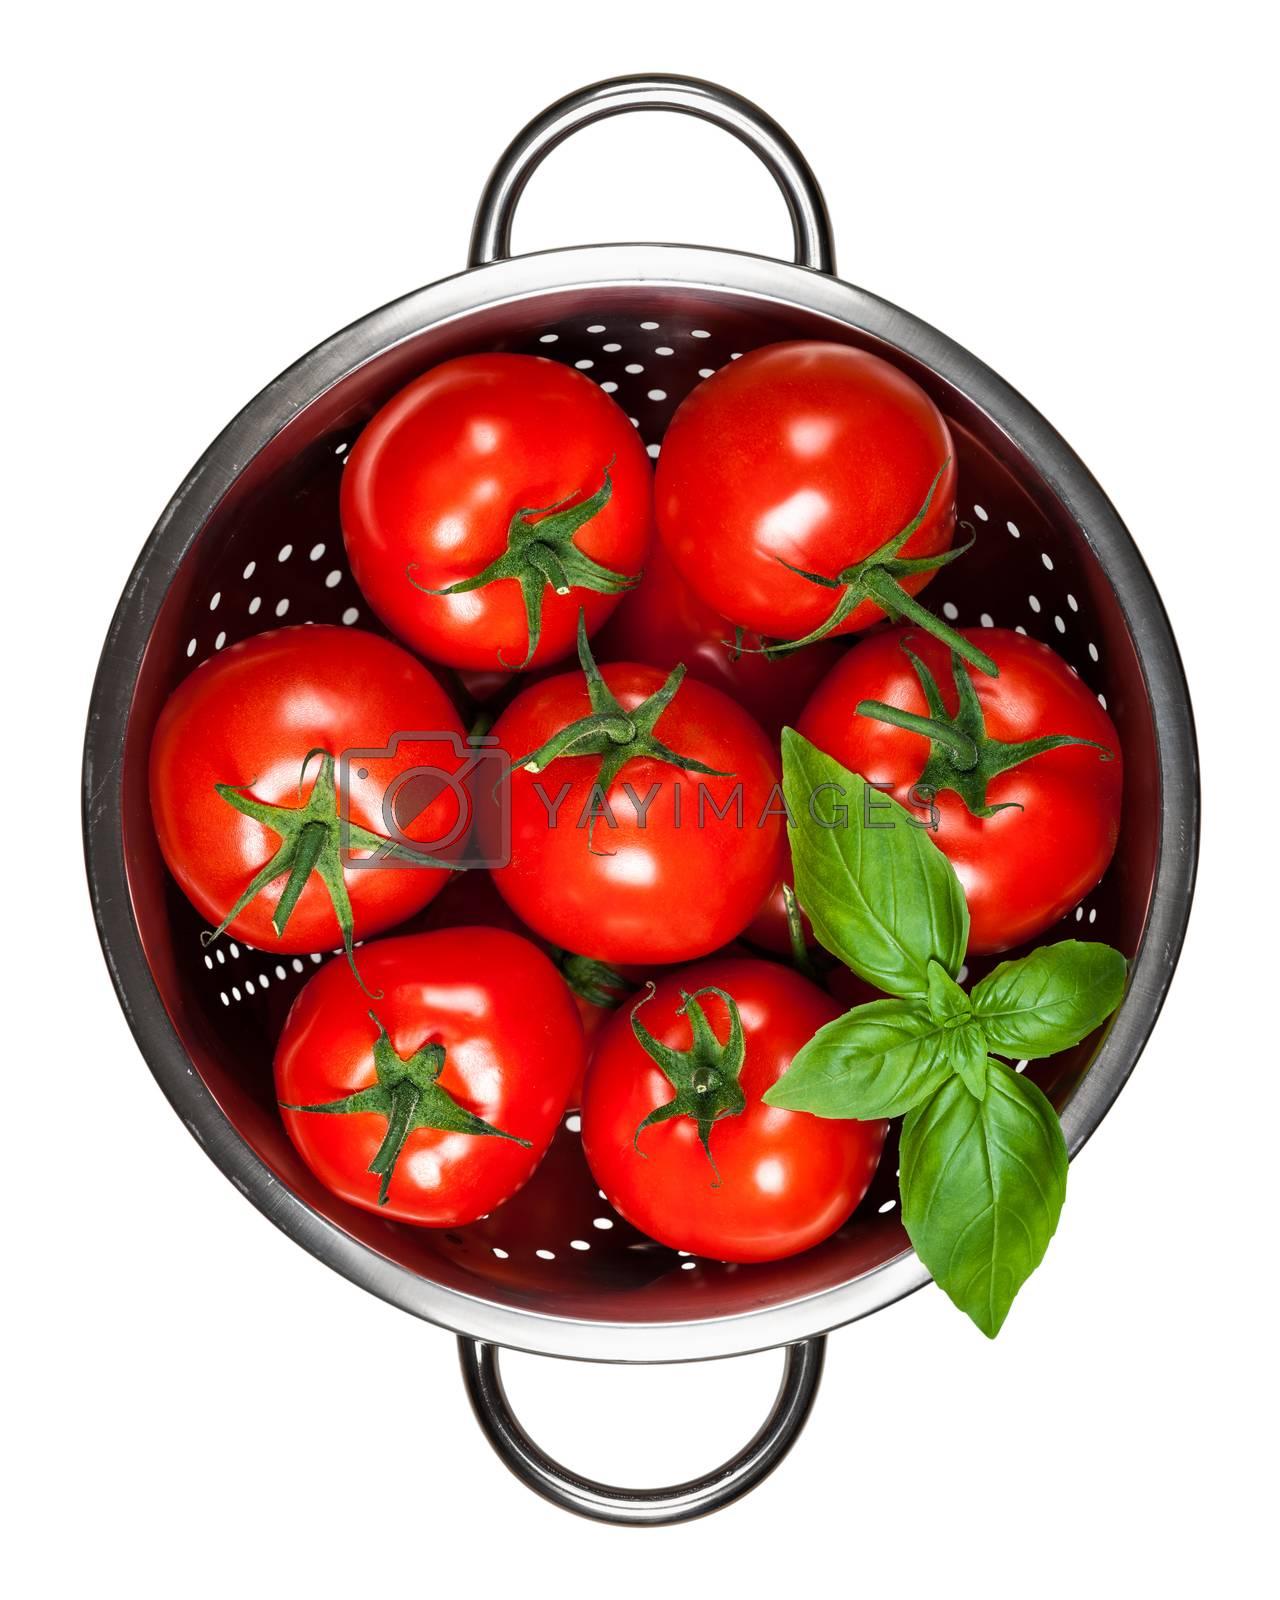 Royalty free image of Tomatoes With Basil by bozena_fulawka